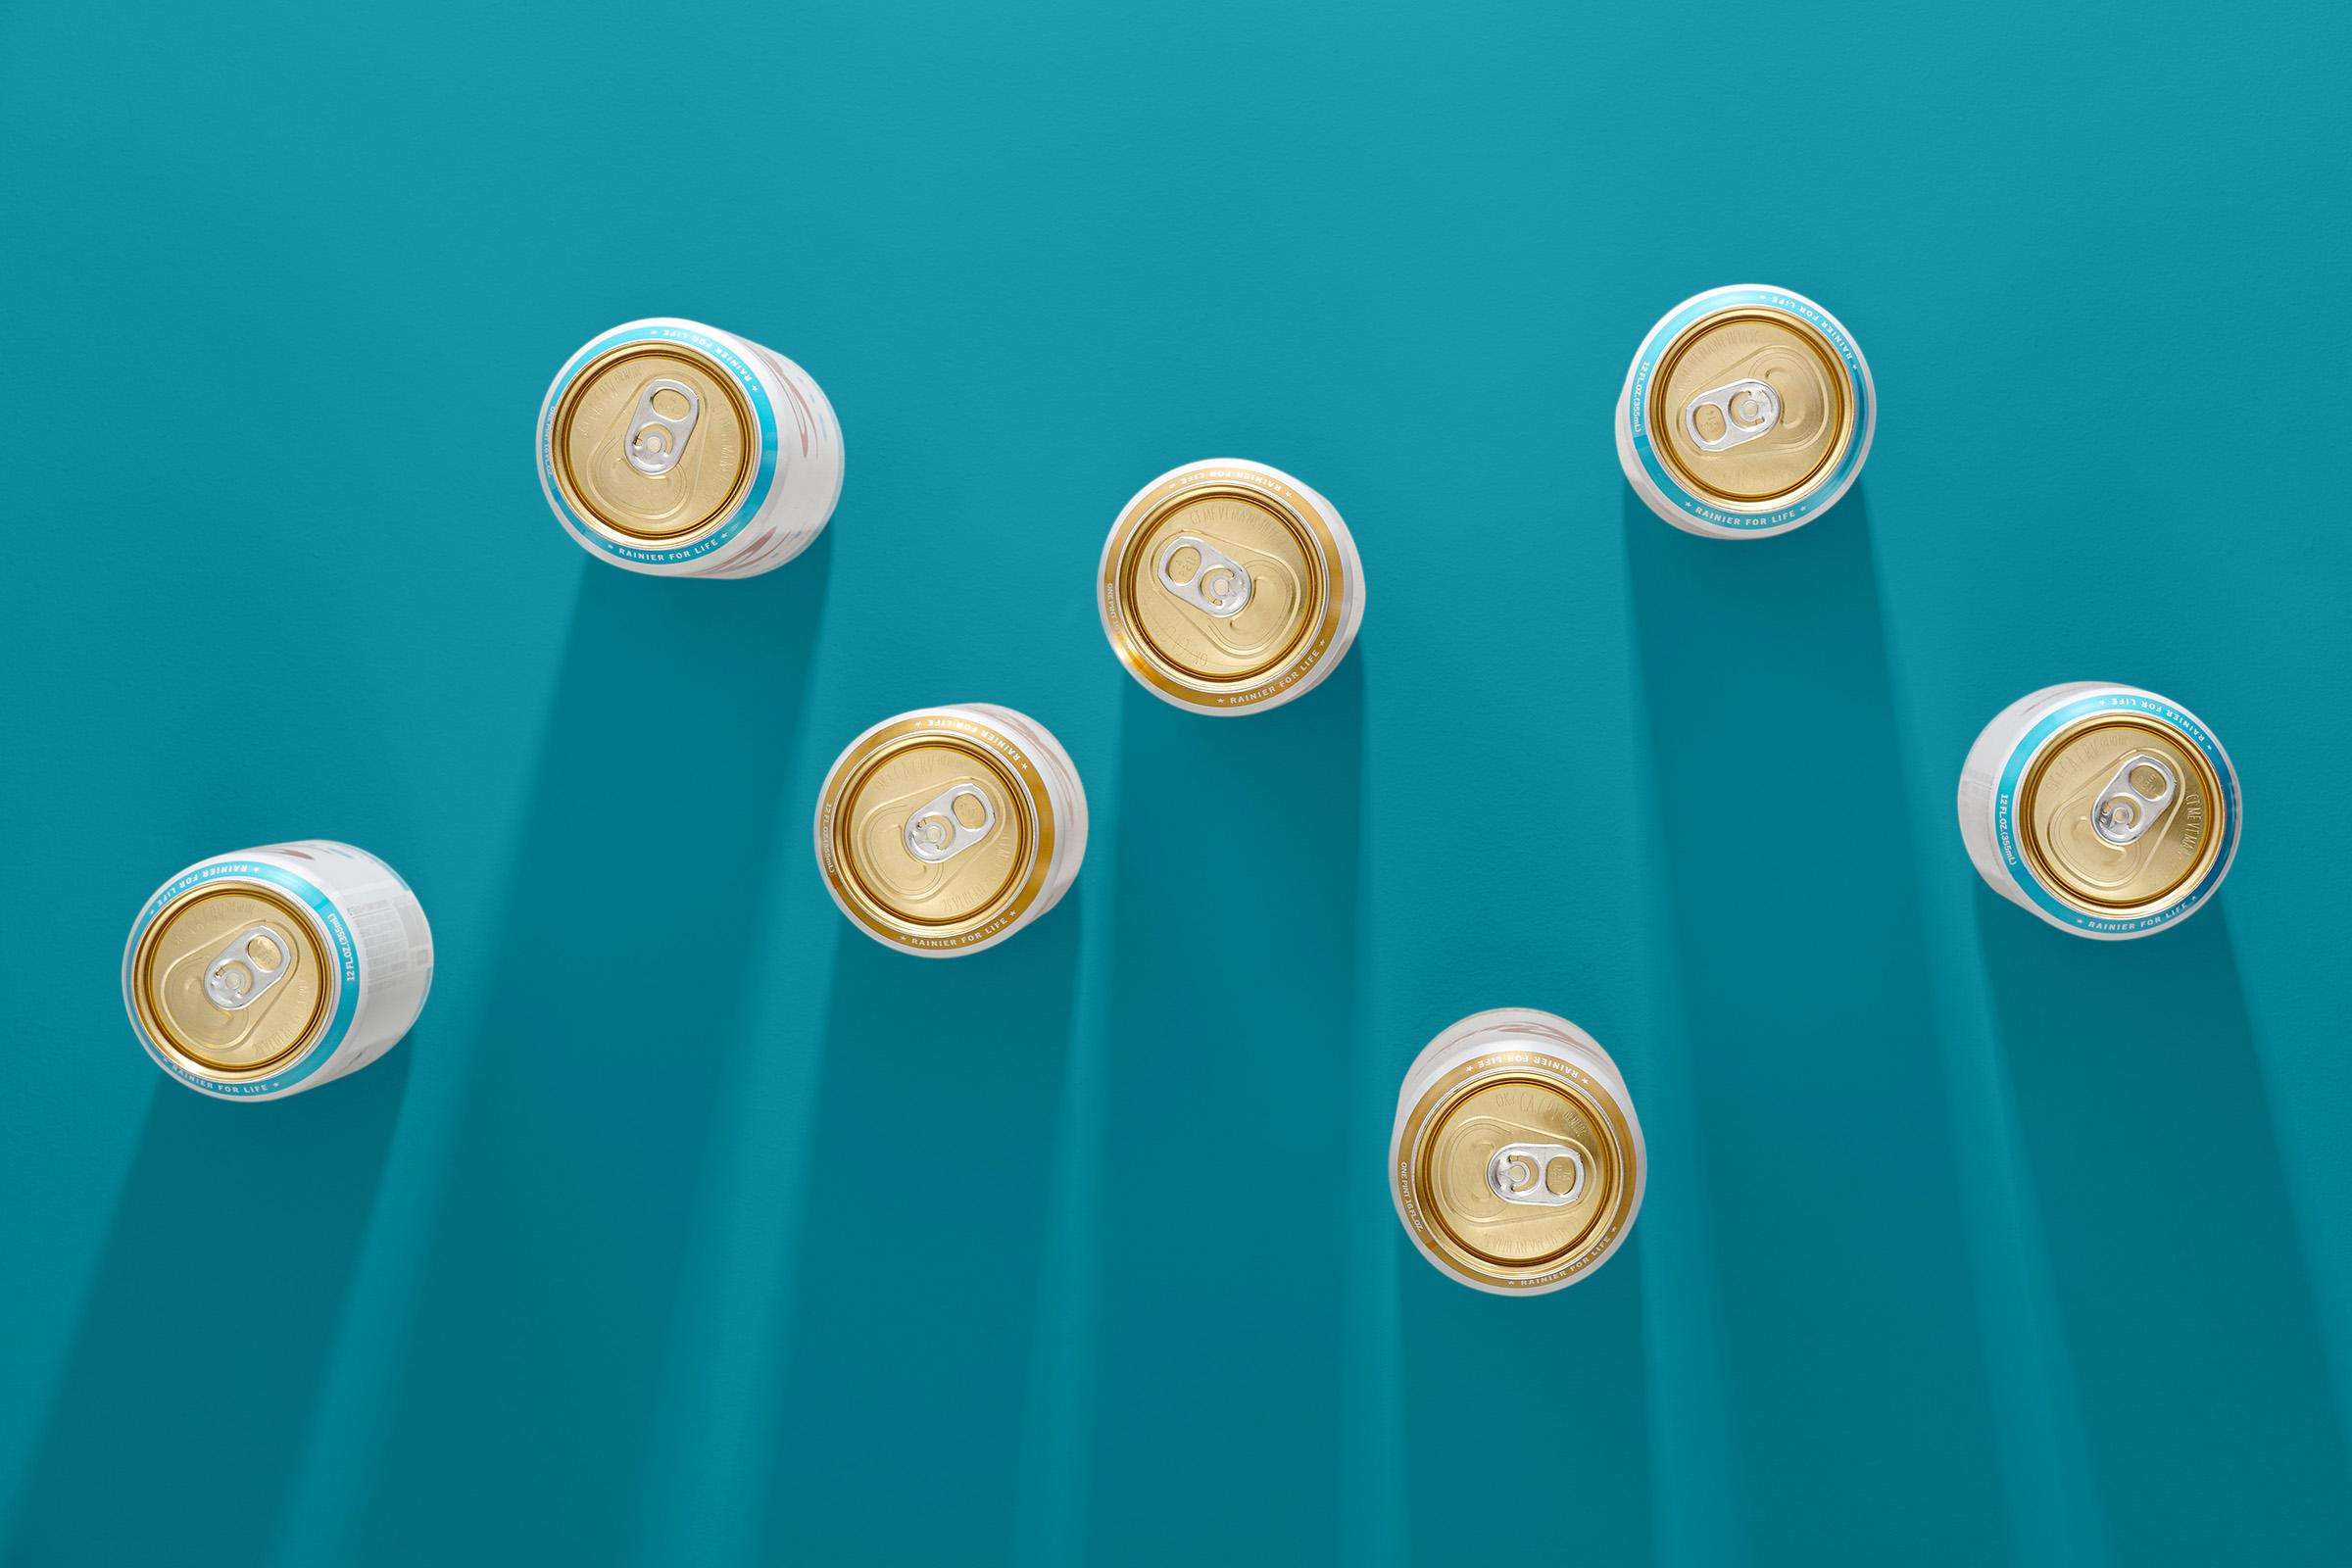 parliament-rainier-cans-overhead-01-web.jpg